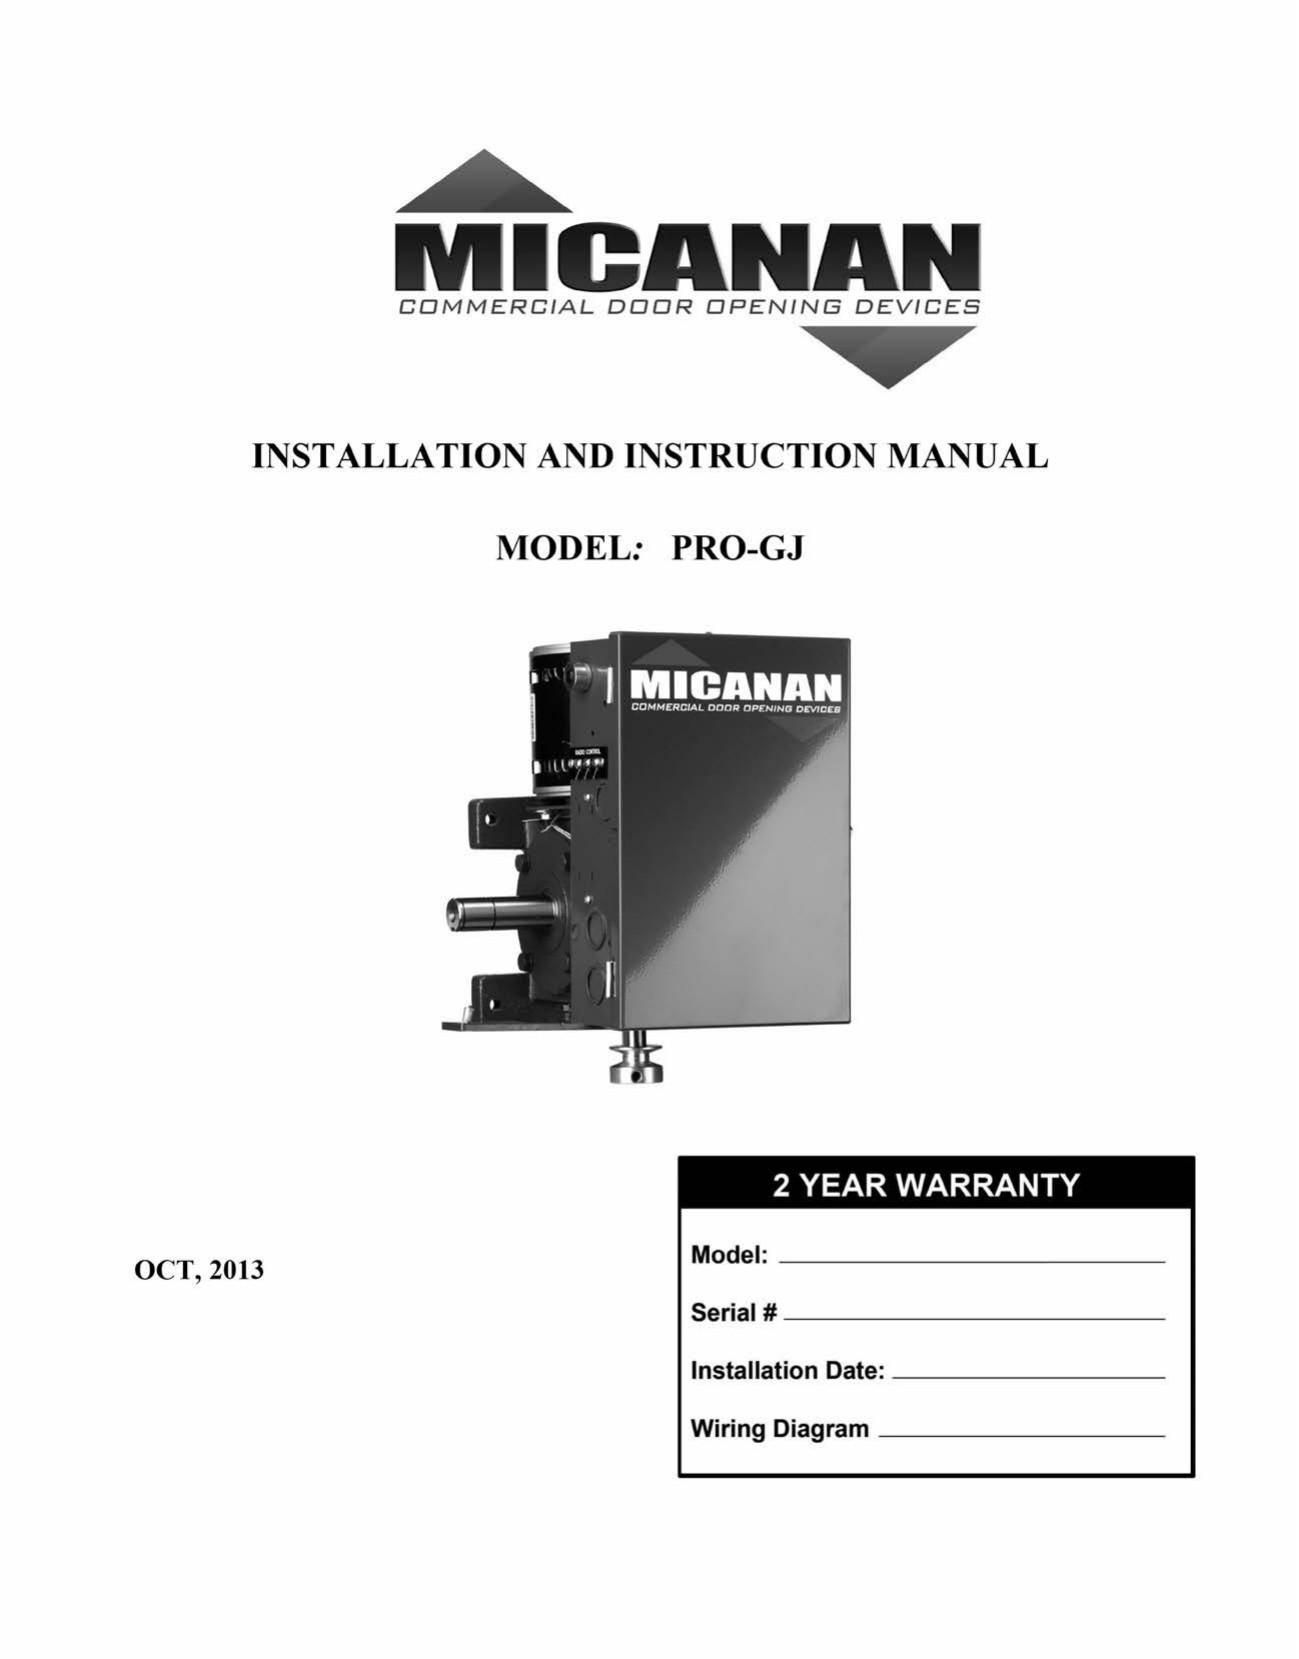 Qd Control Box Wiring Diagram Multipage Pdf File Of Qd Control Box Wiring Diagram